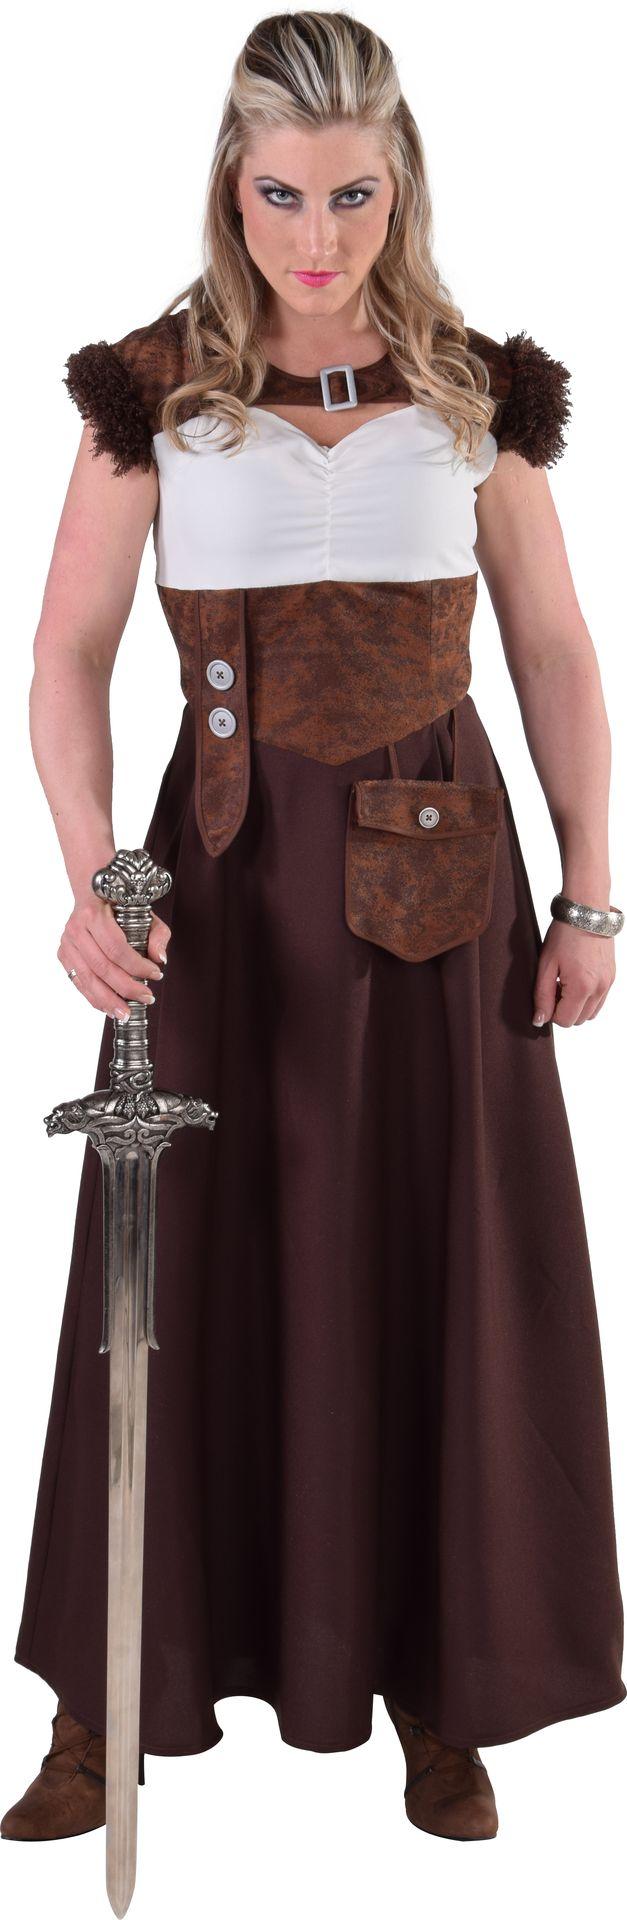 Carnaval vikingen jurk dames